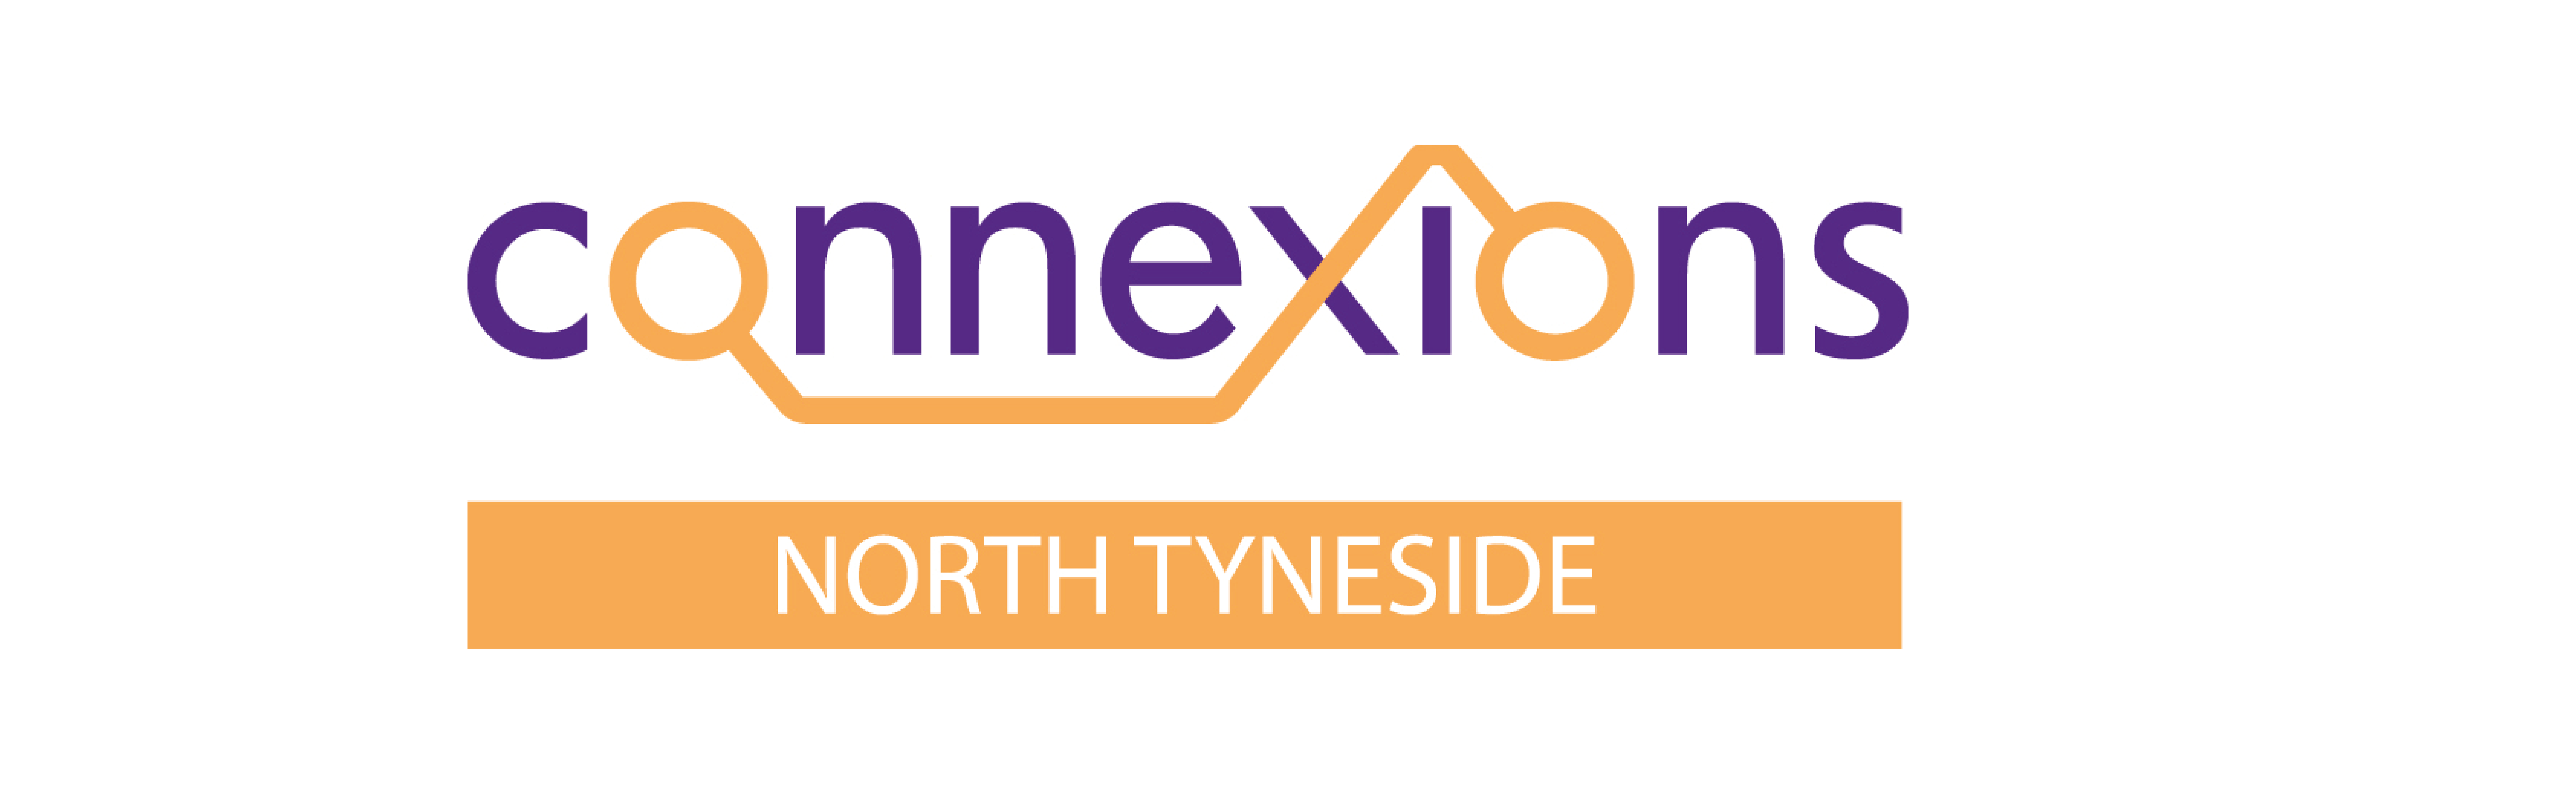 Connexions North Tyneside